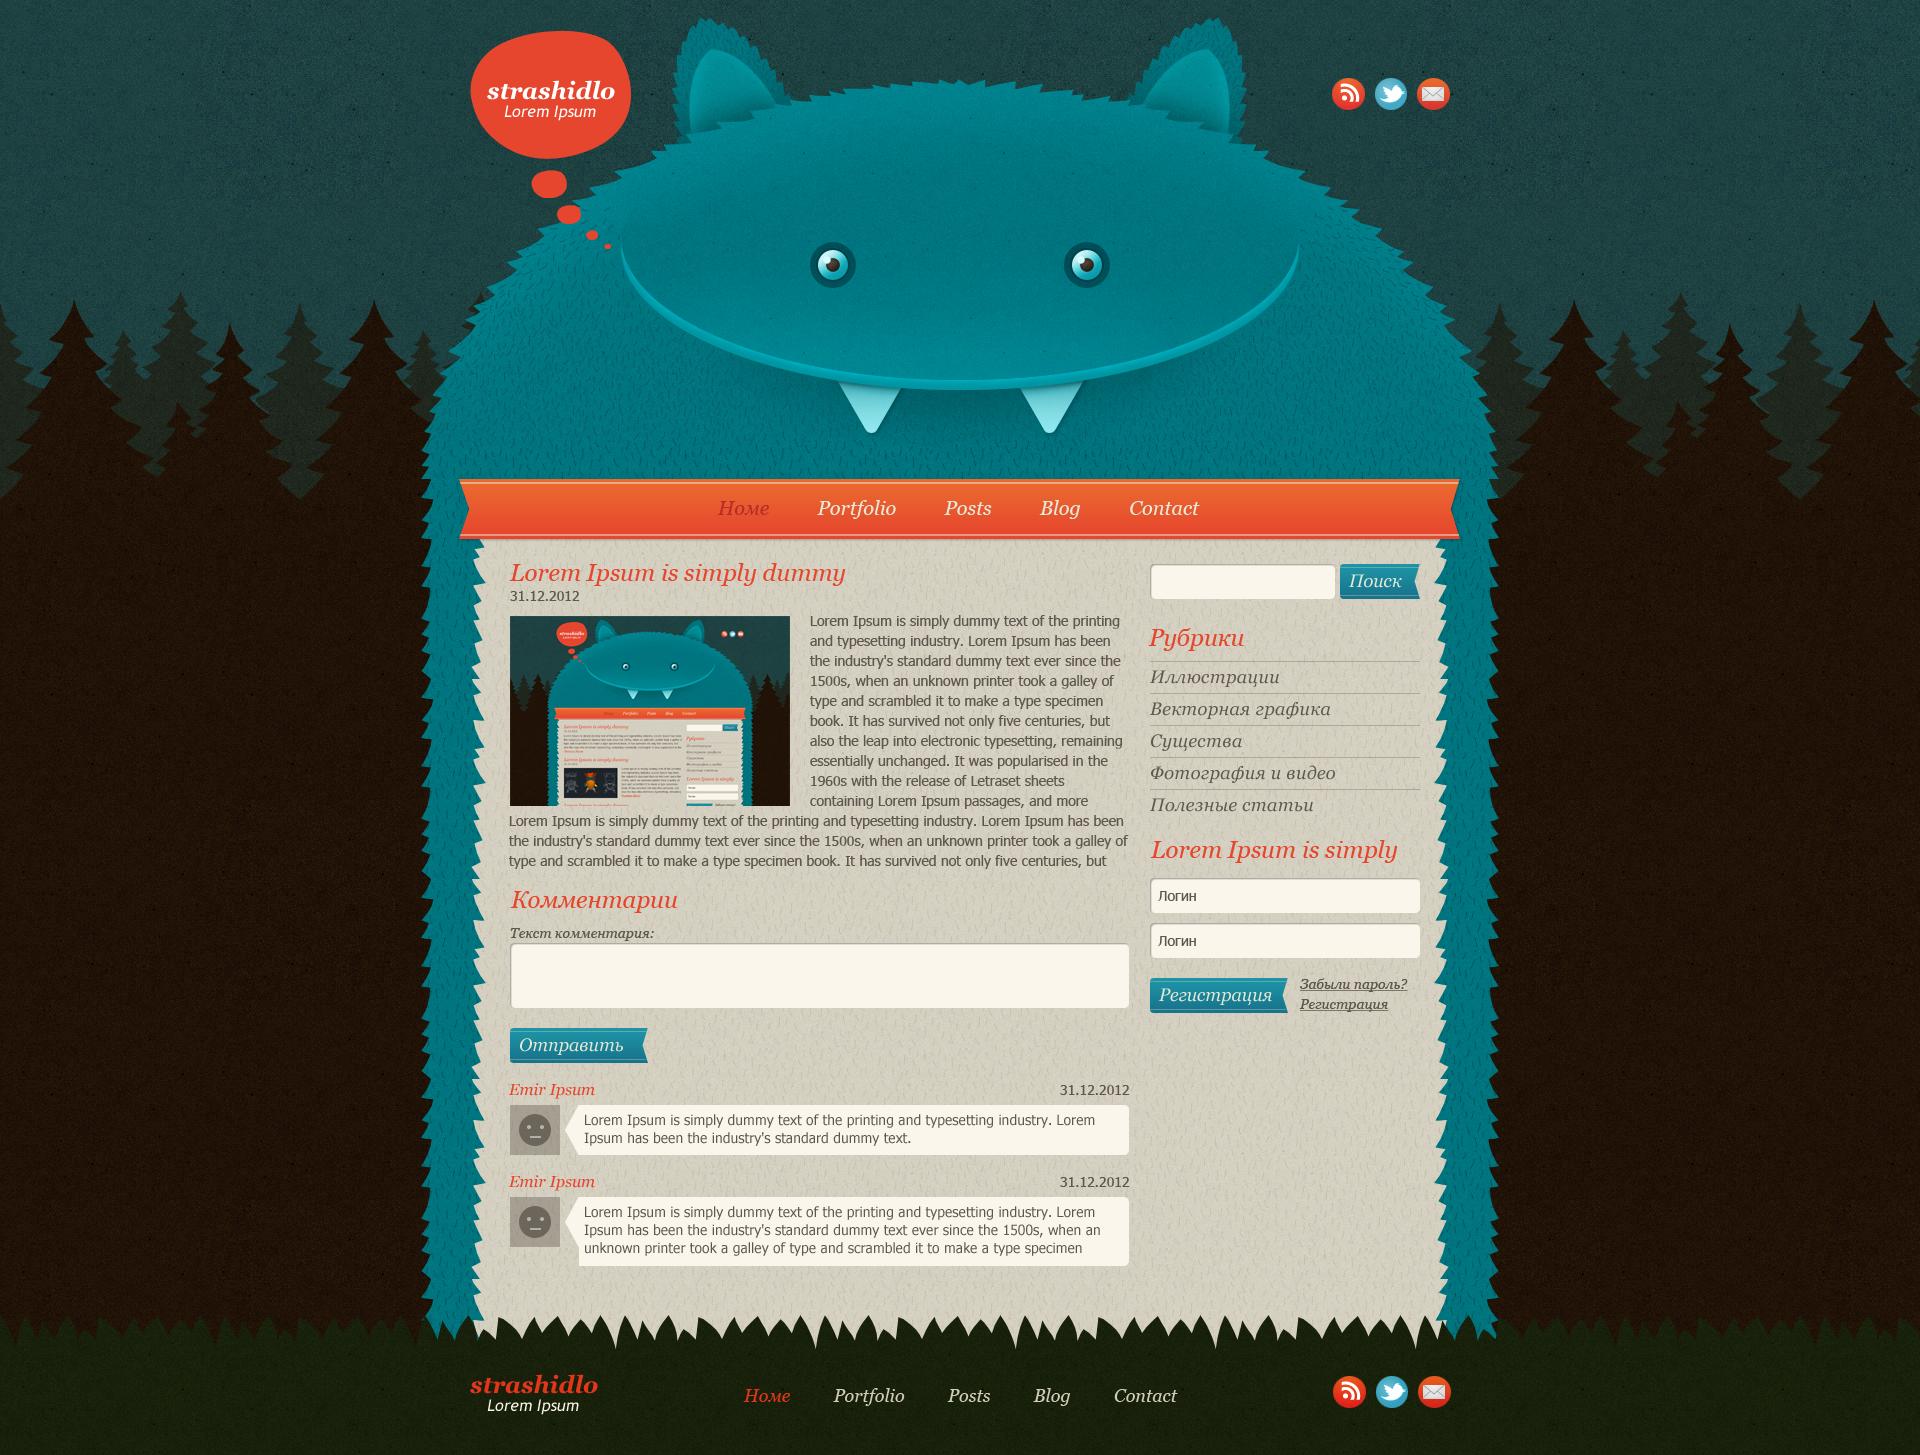 Strashidlo blog design